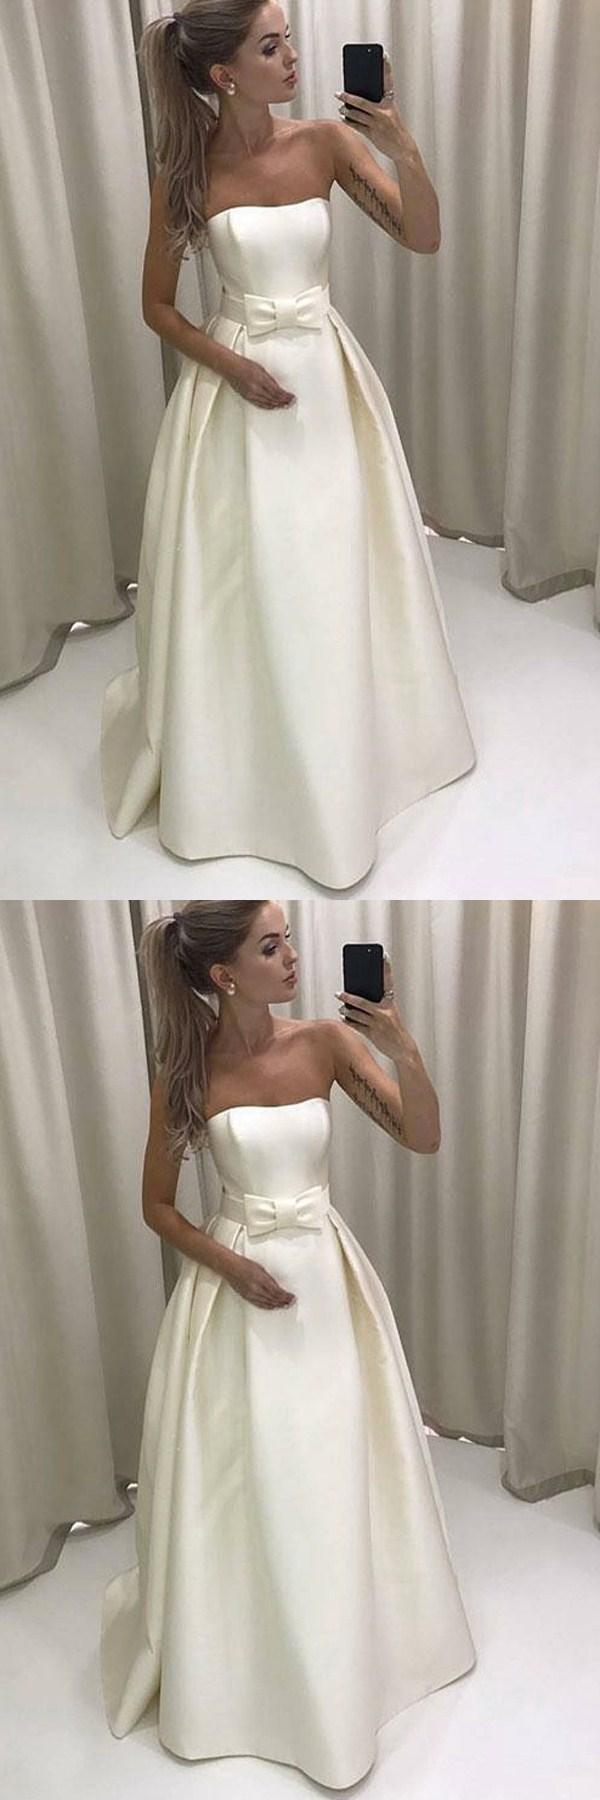 Aline sweetheart sweep train ivory satin wedding dress with bowknot